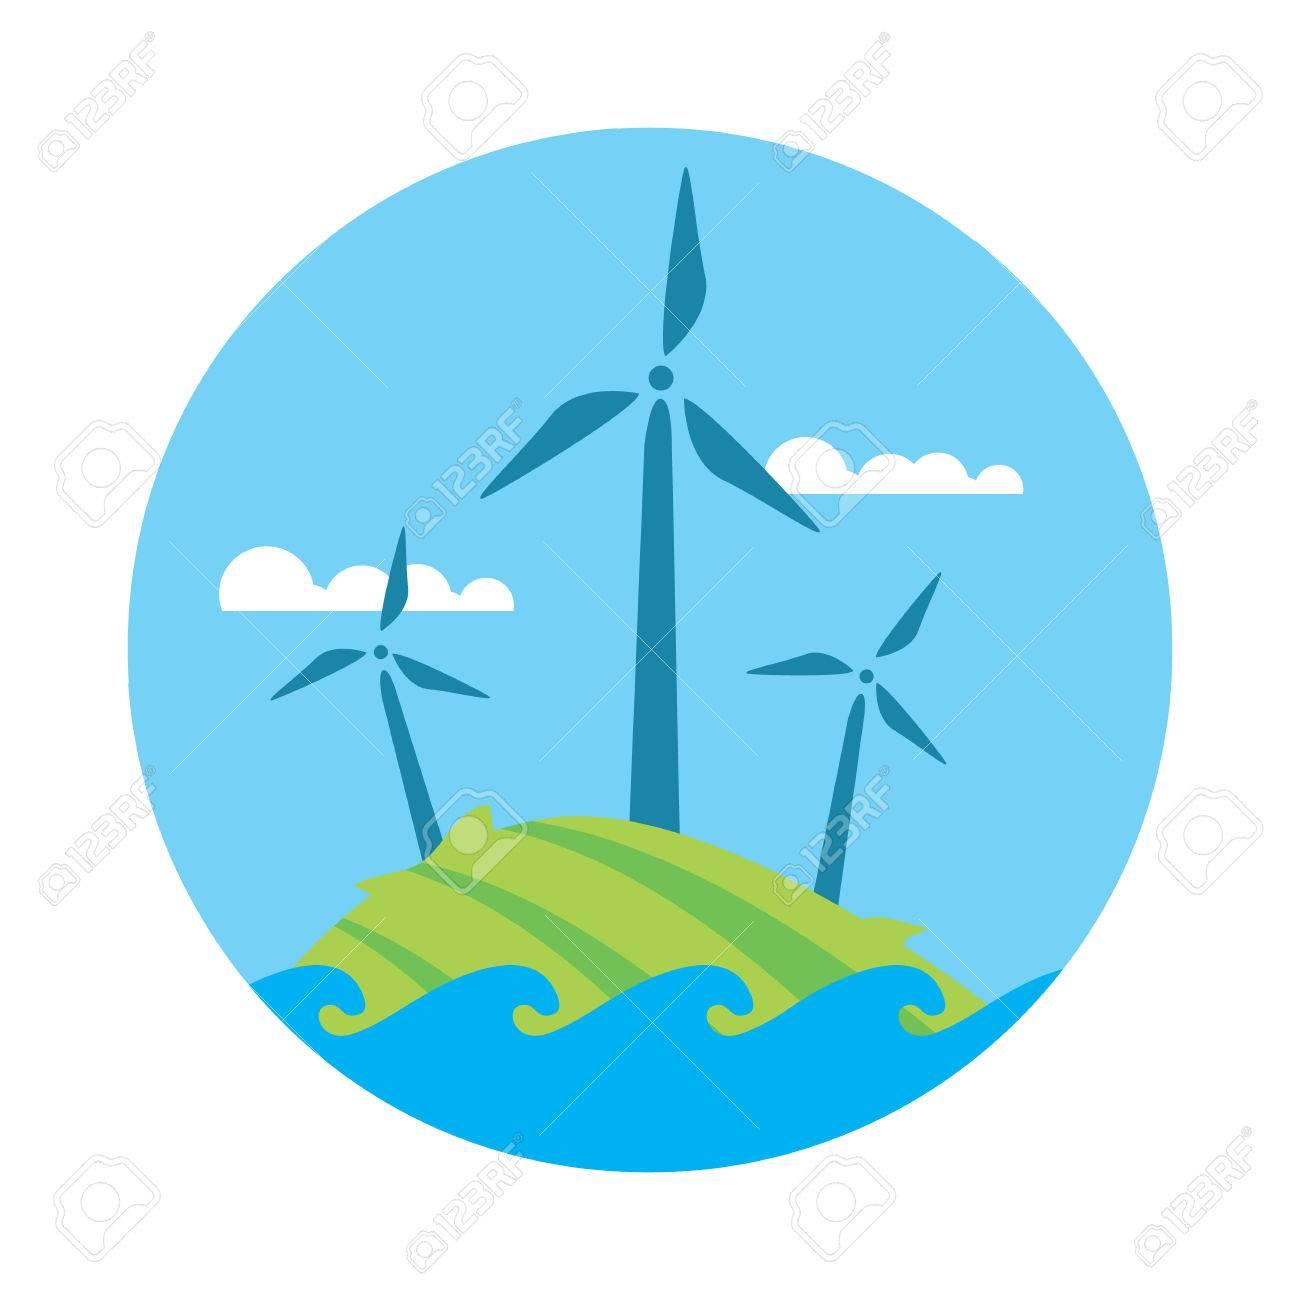 1300x1300 Wind Farm Wind Turbine Wind Power Renewable Energy Clip Art